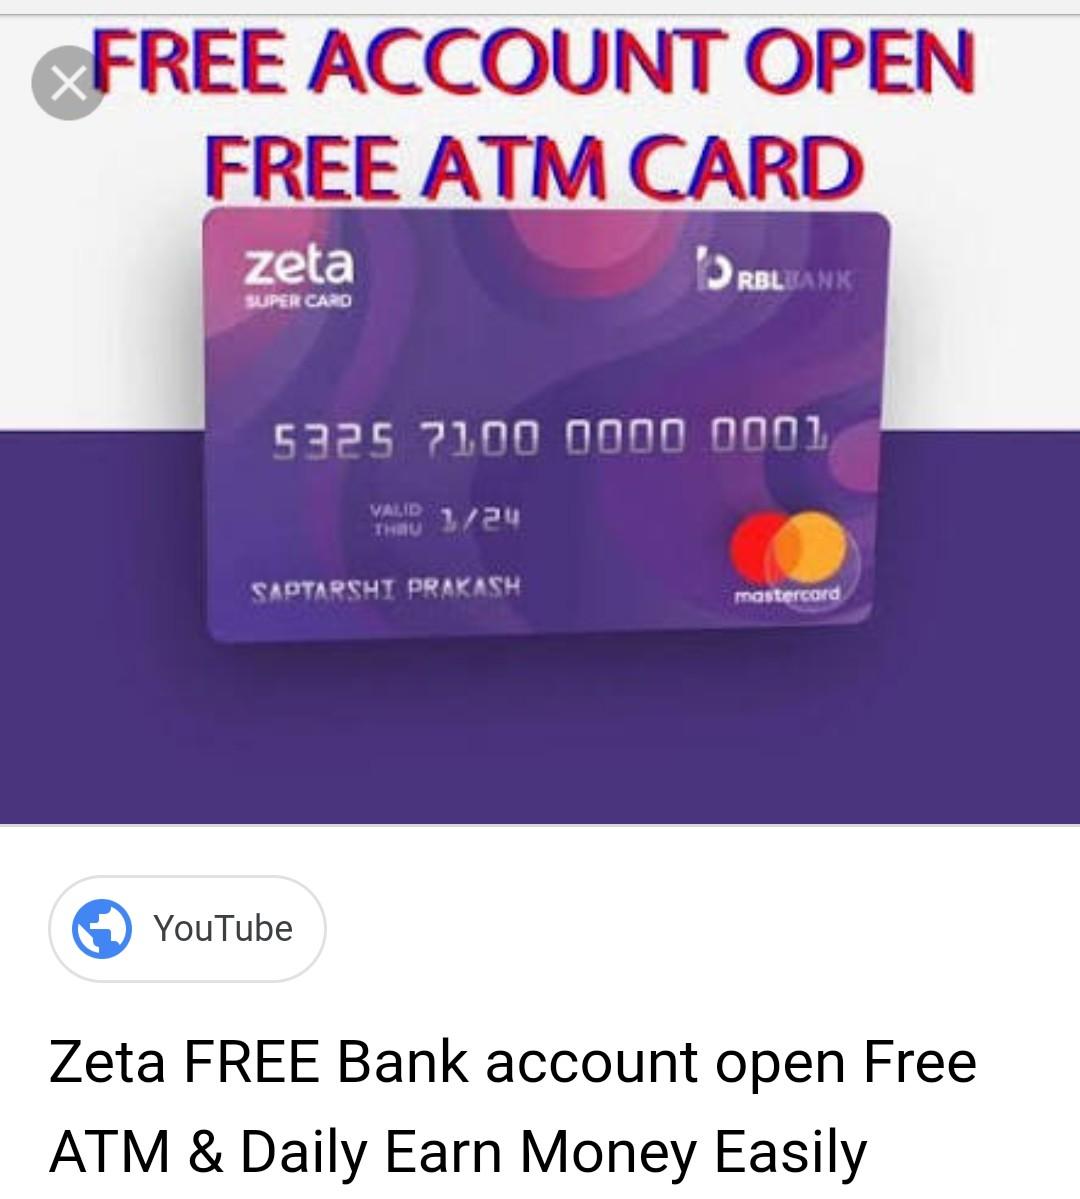 Open Zeta Free Bank Account & Free ATM card | DesiDime